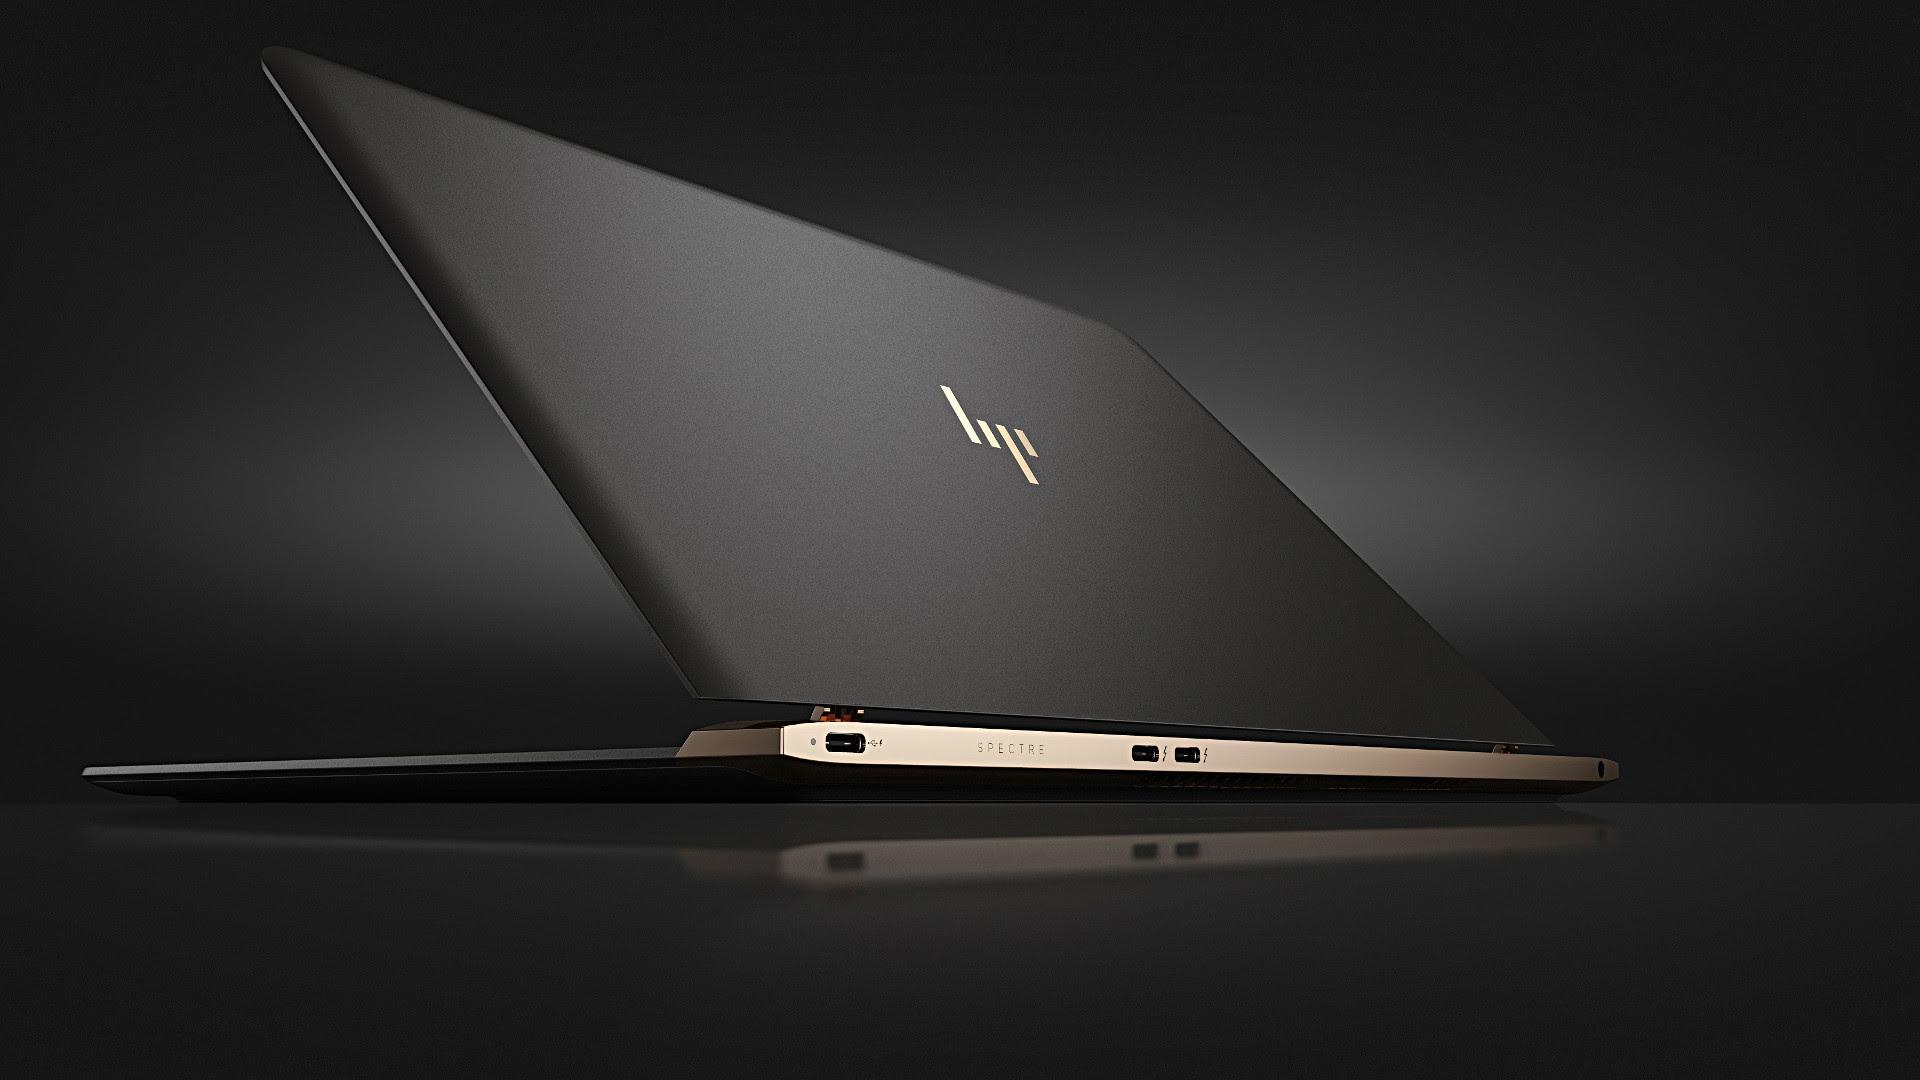 5500 Wallpaper Hd Hp Laptop Terbaru